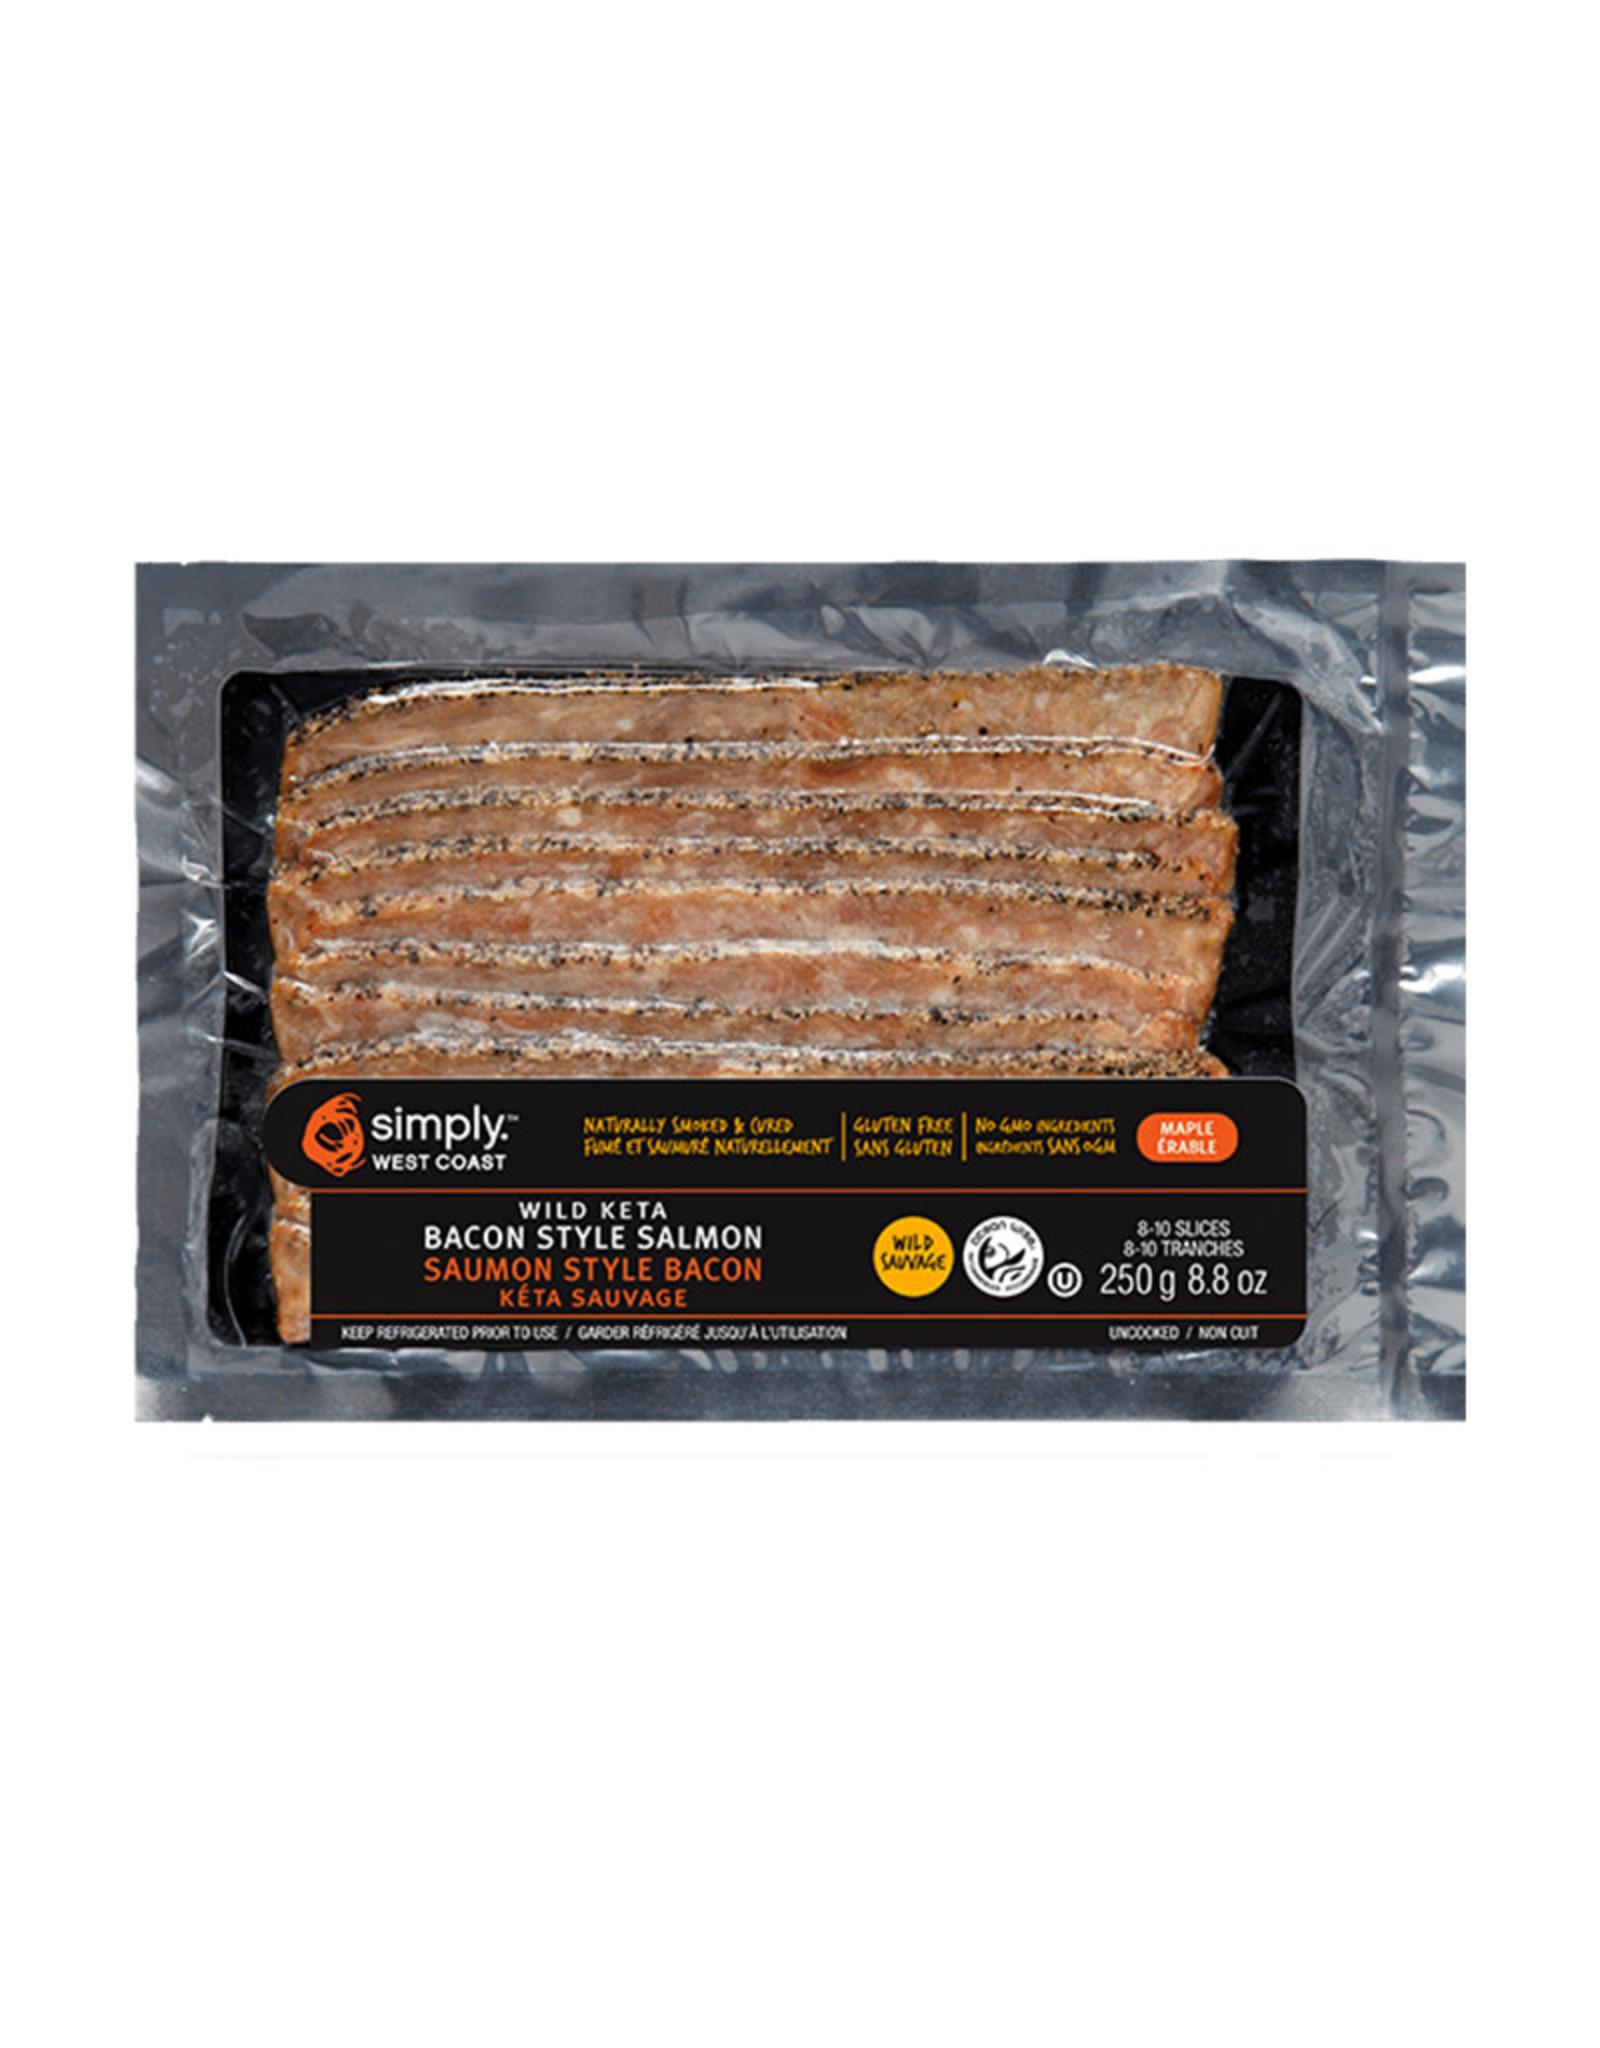 Simply West Coast Simply West Coast - Bacon Style Salmon